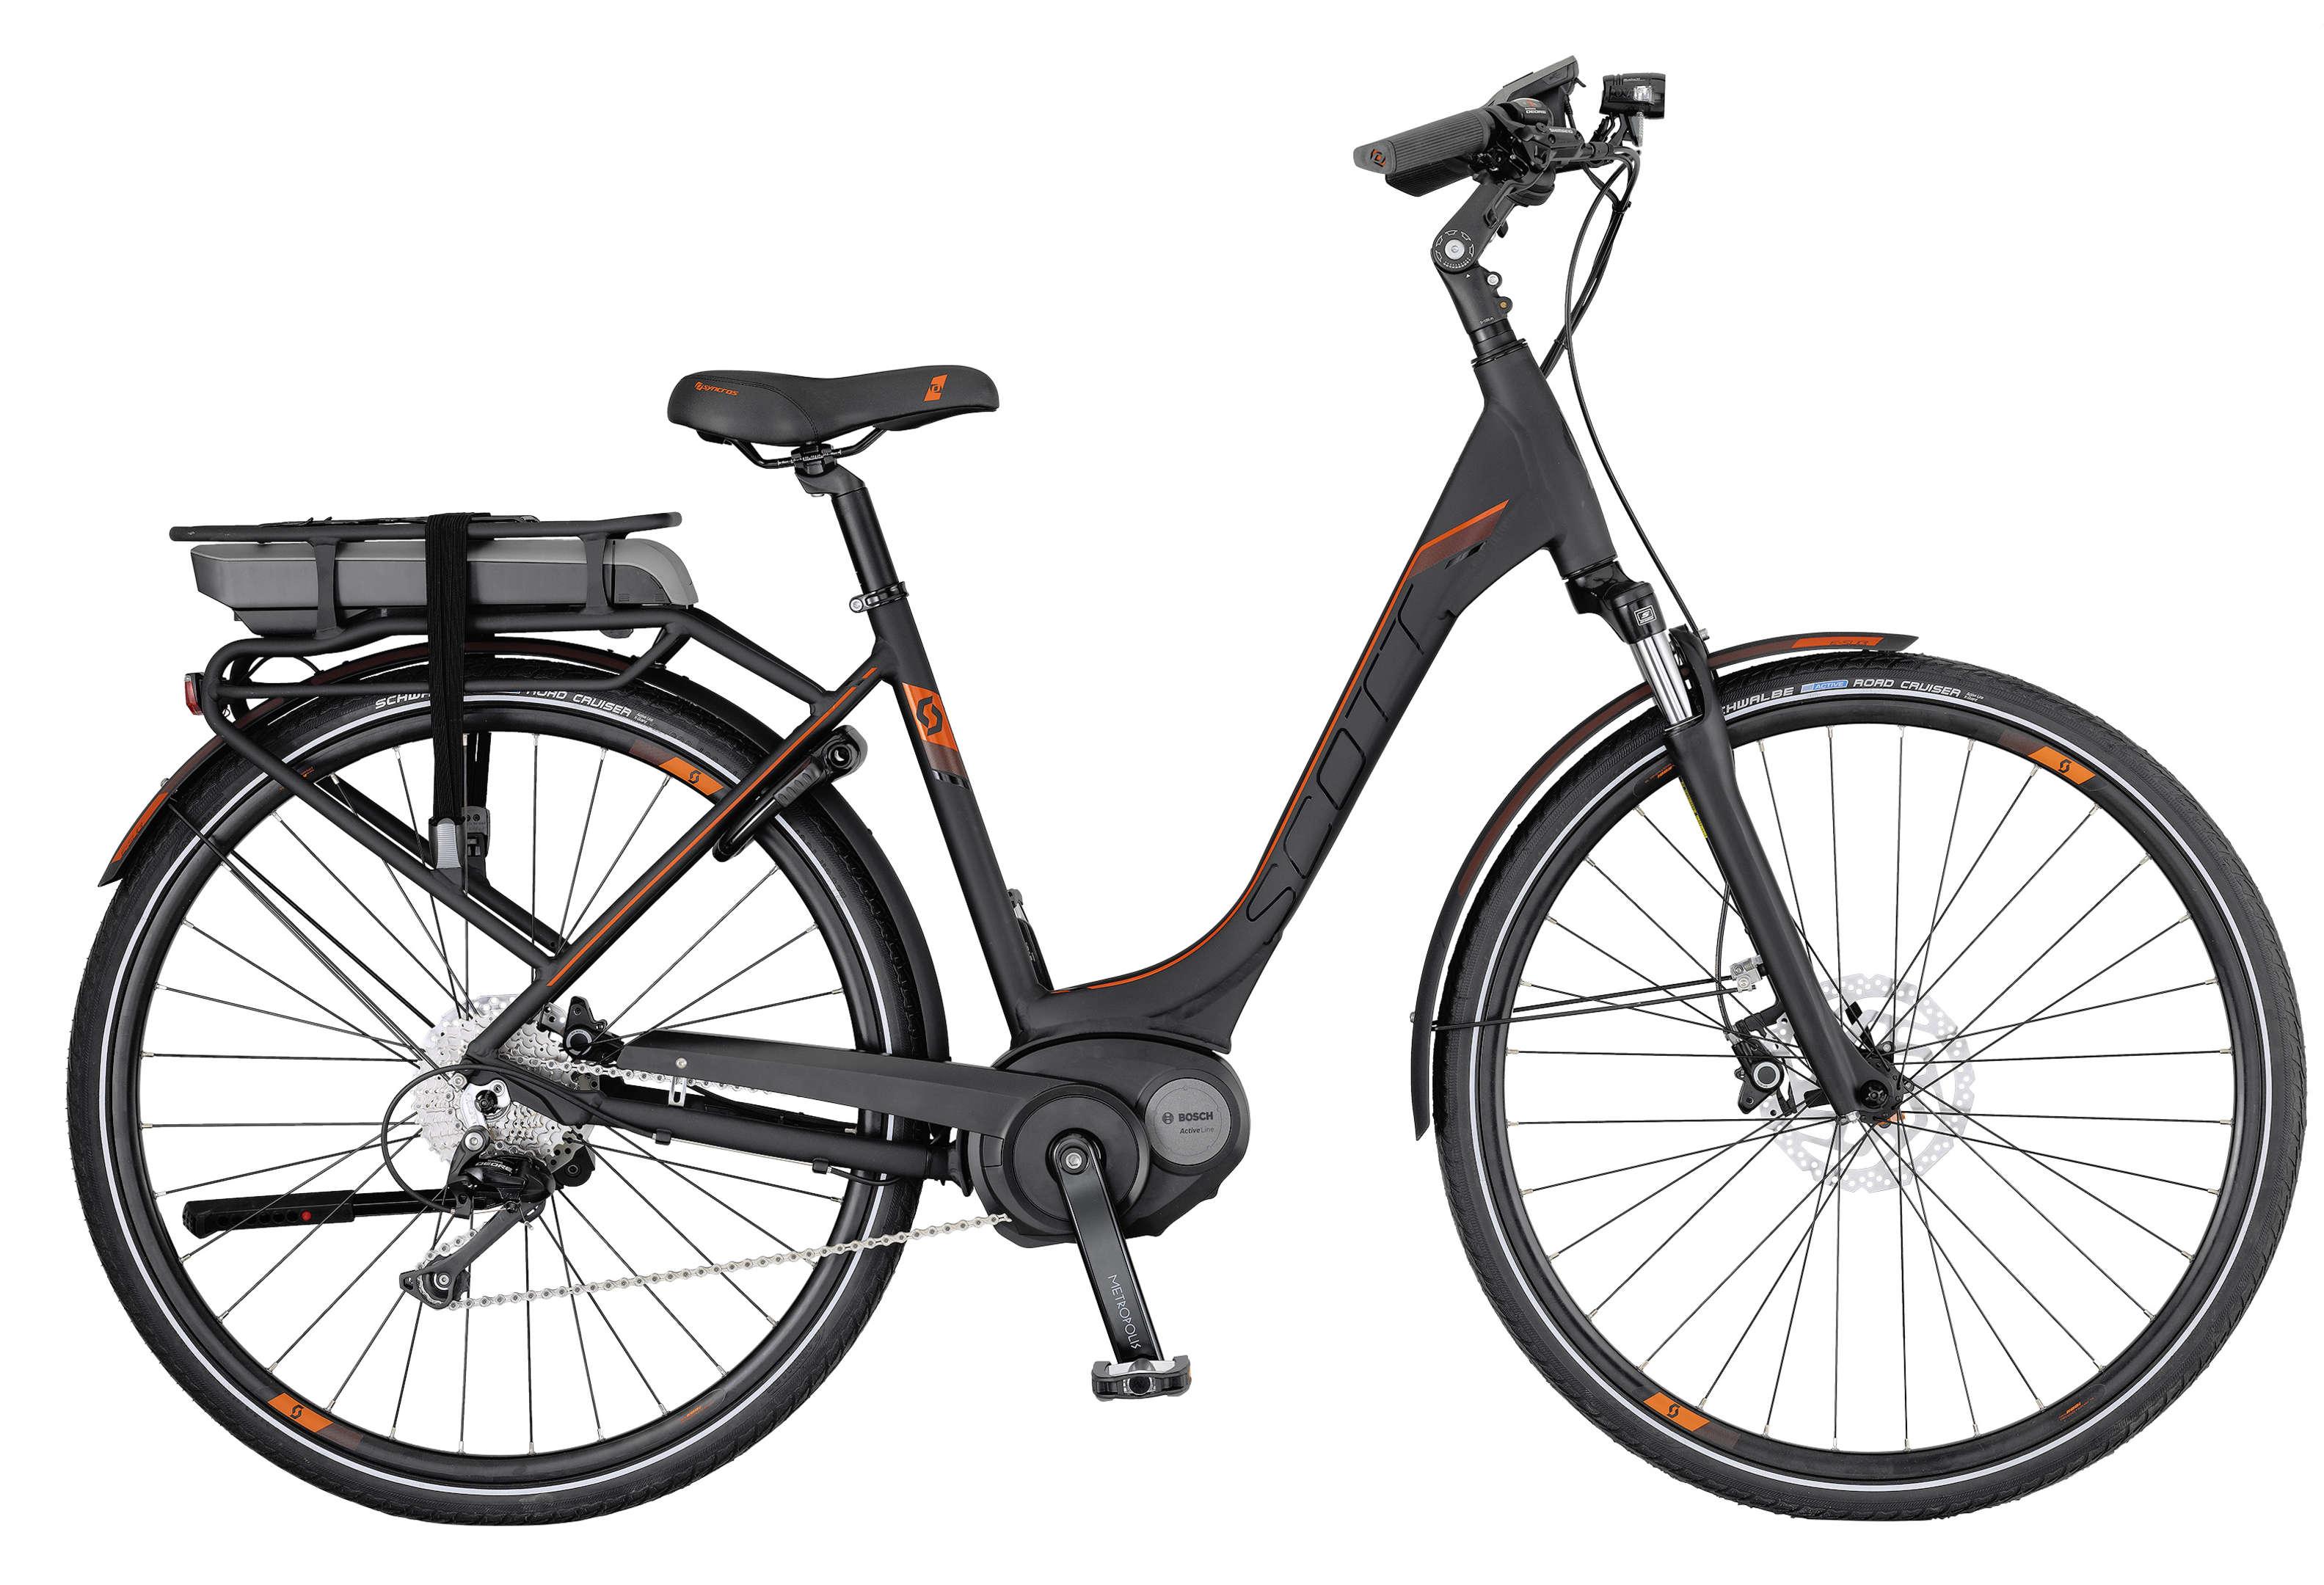 scott e bike e sub active unisex eurorad bikeleasingeurorad bikeleasing. Black Bedroom Furniture Sets. Home Design Ideas